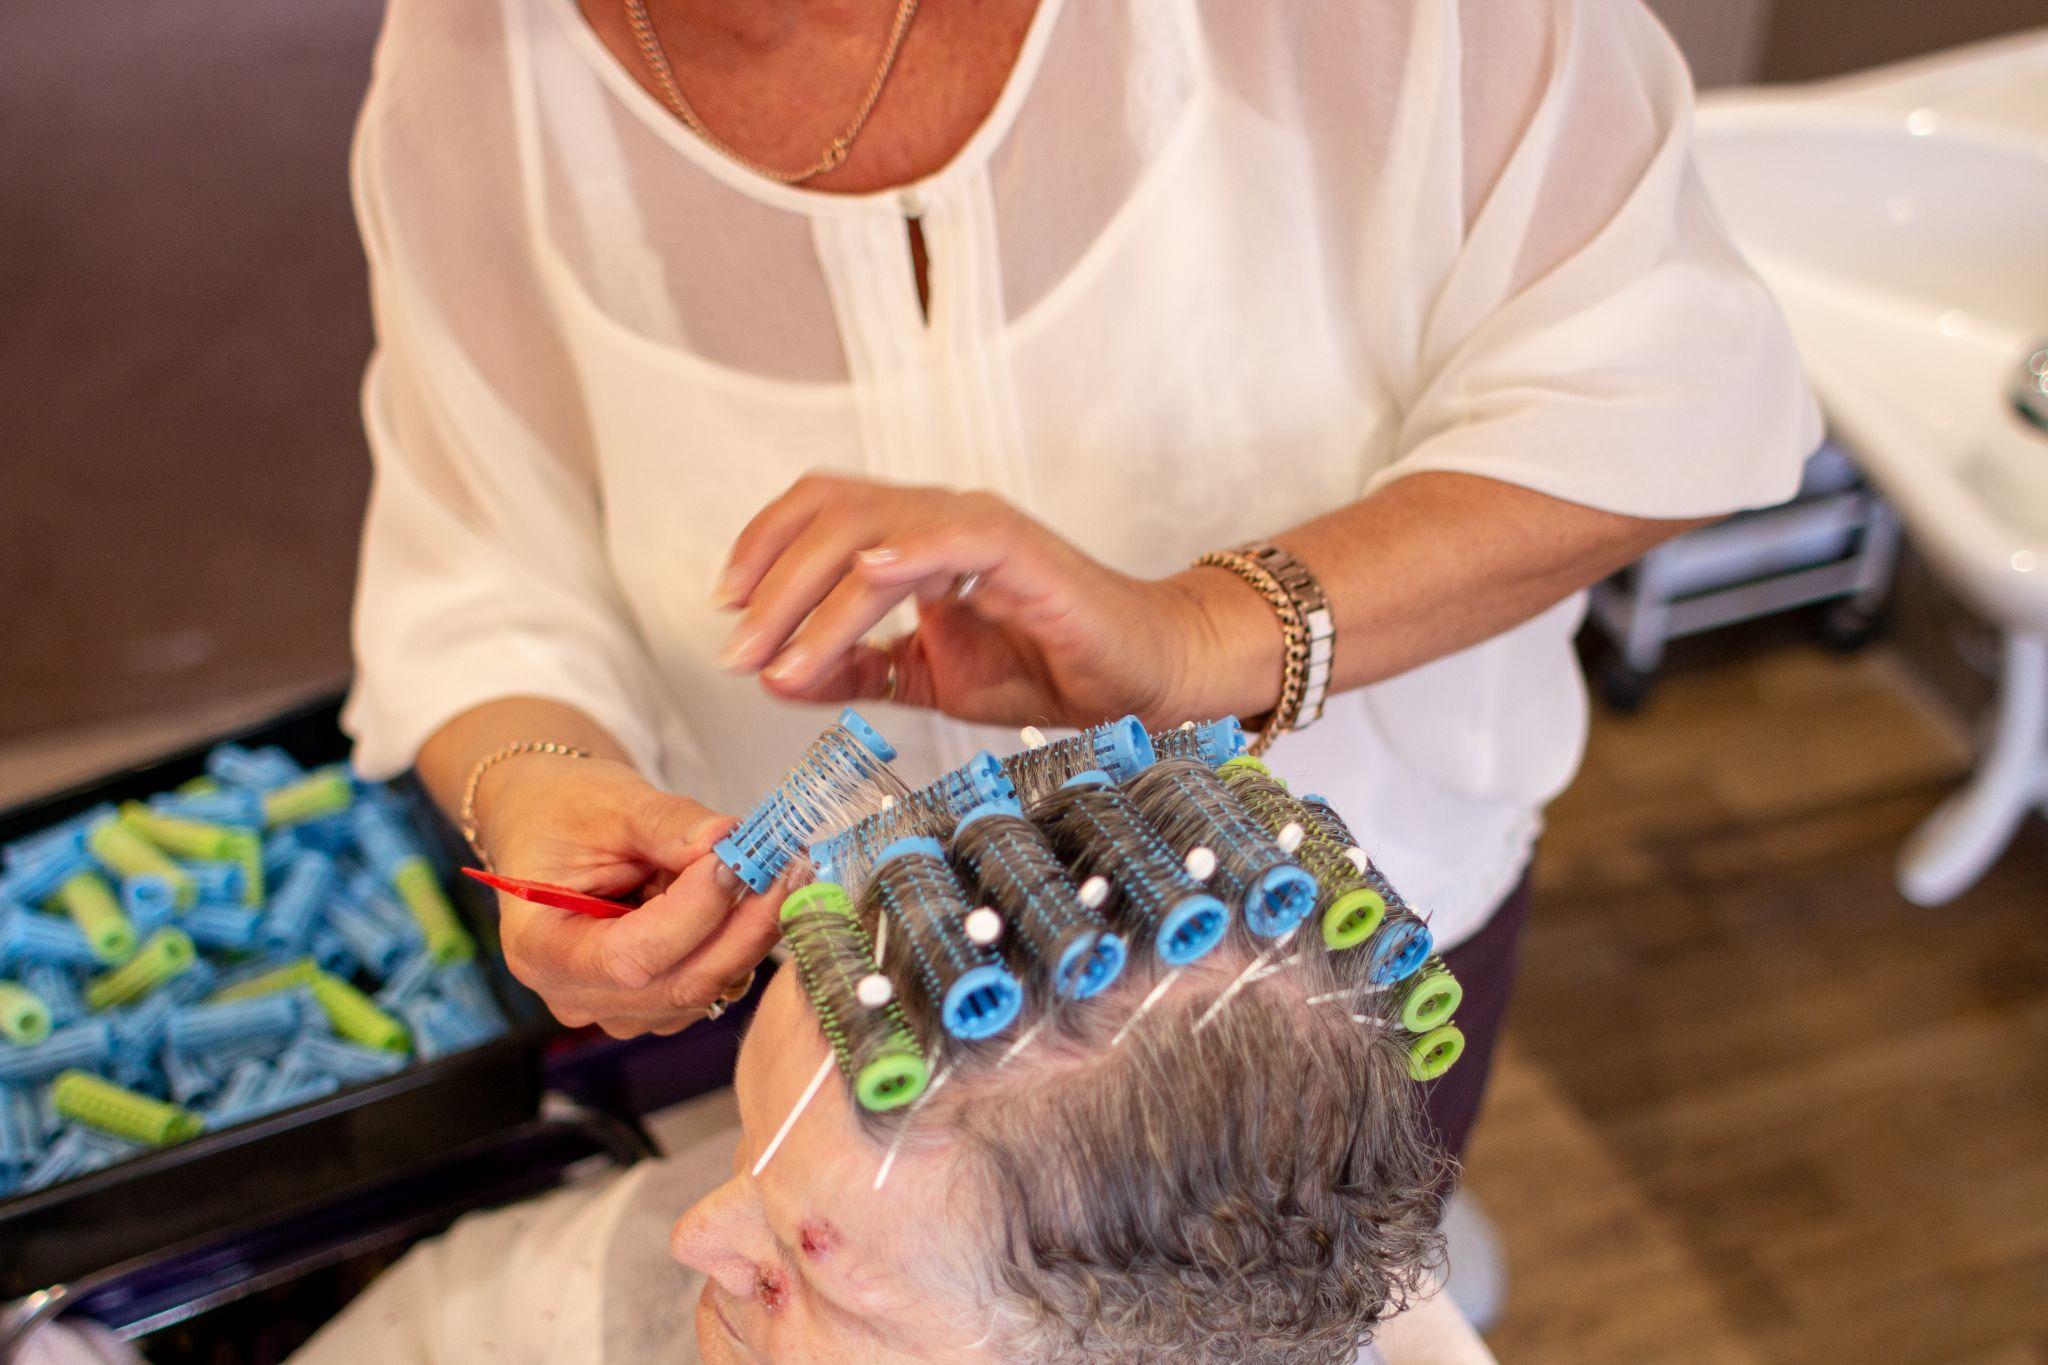 craig healthcare residents lifestyle photography hannah layford residents hair